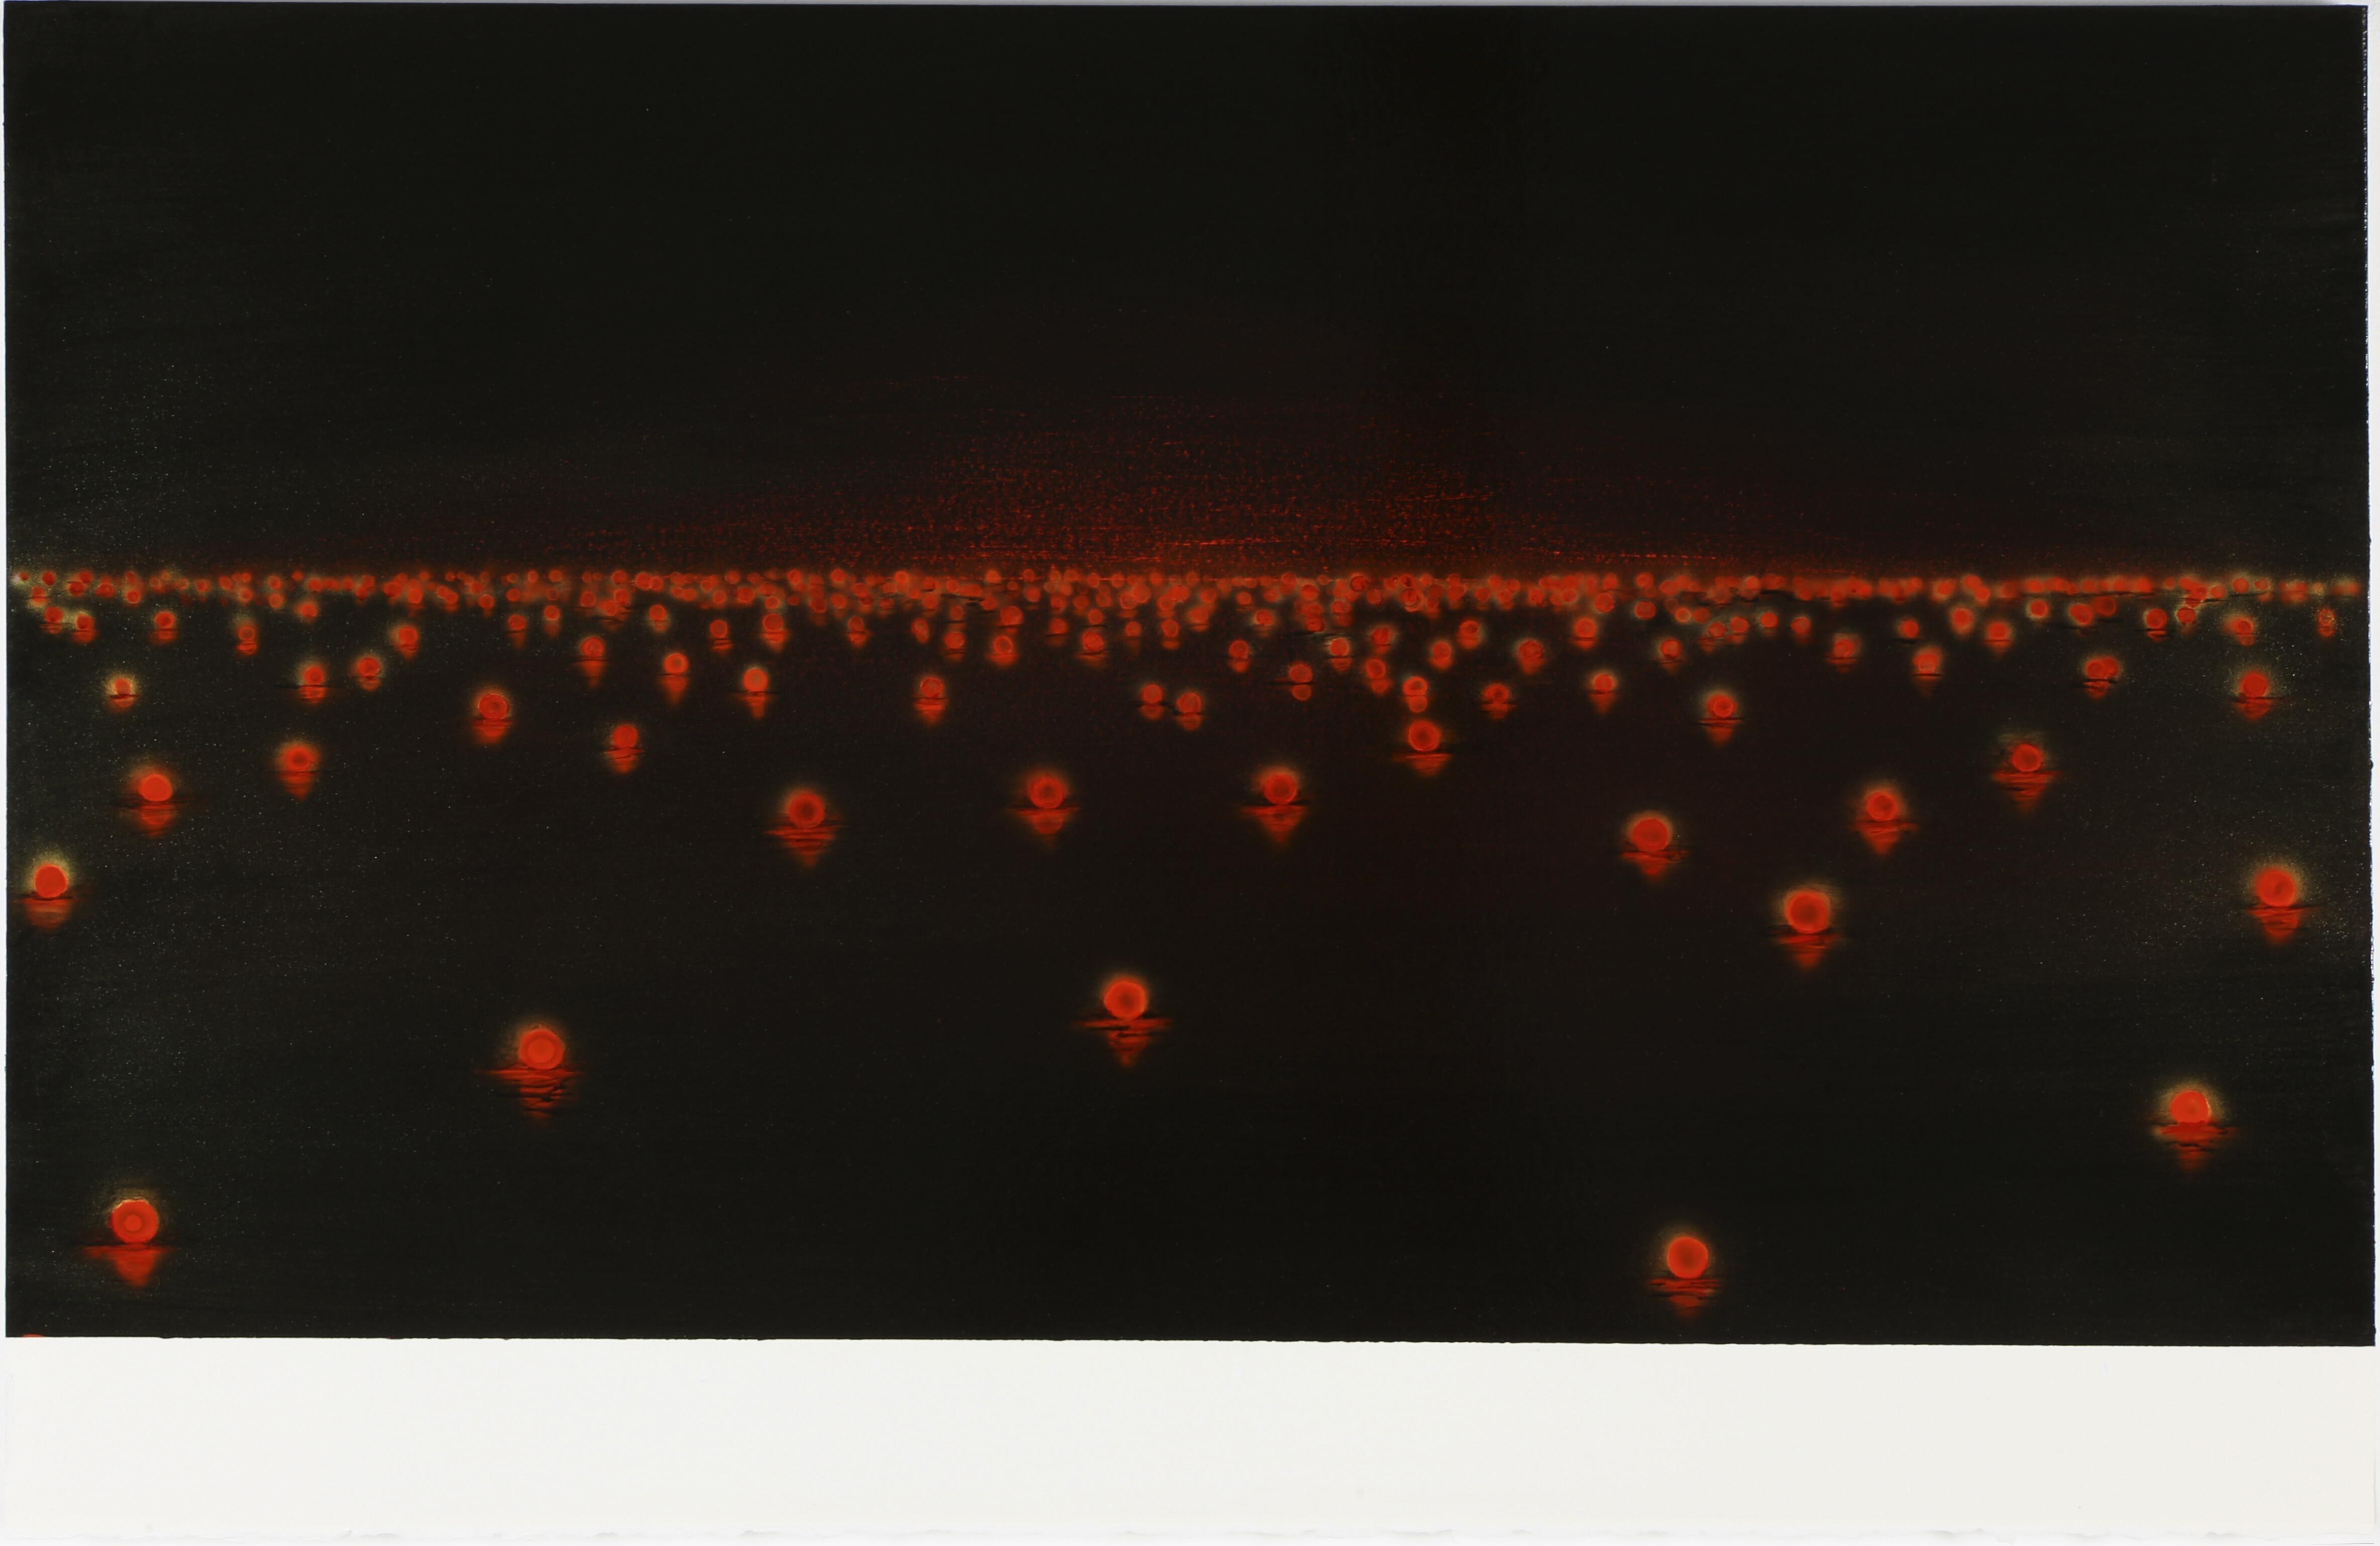 Katsumi Hayakawa, Red Lights, Acrylic on Paper on Wood, 2017